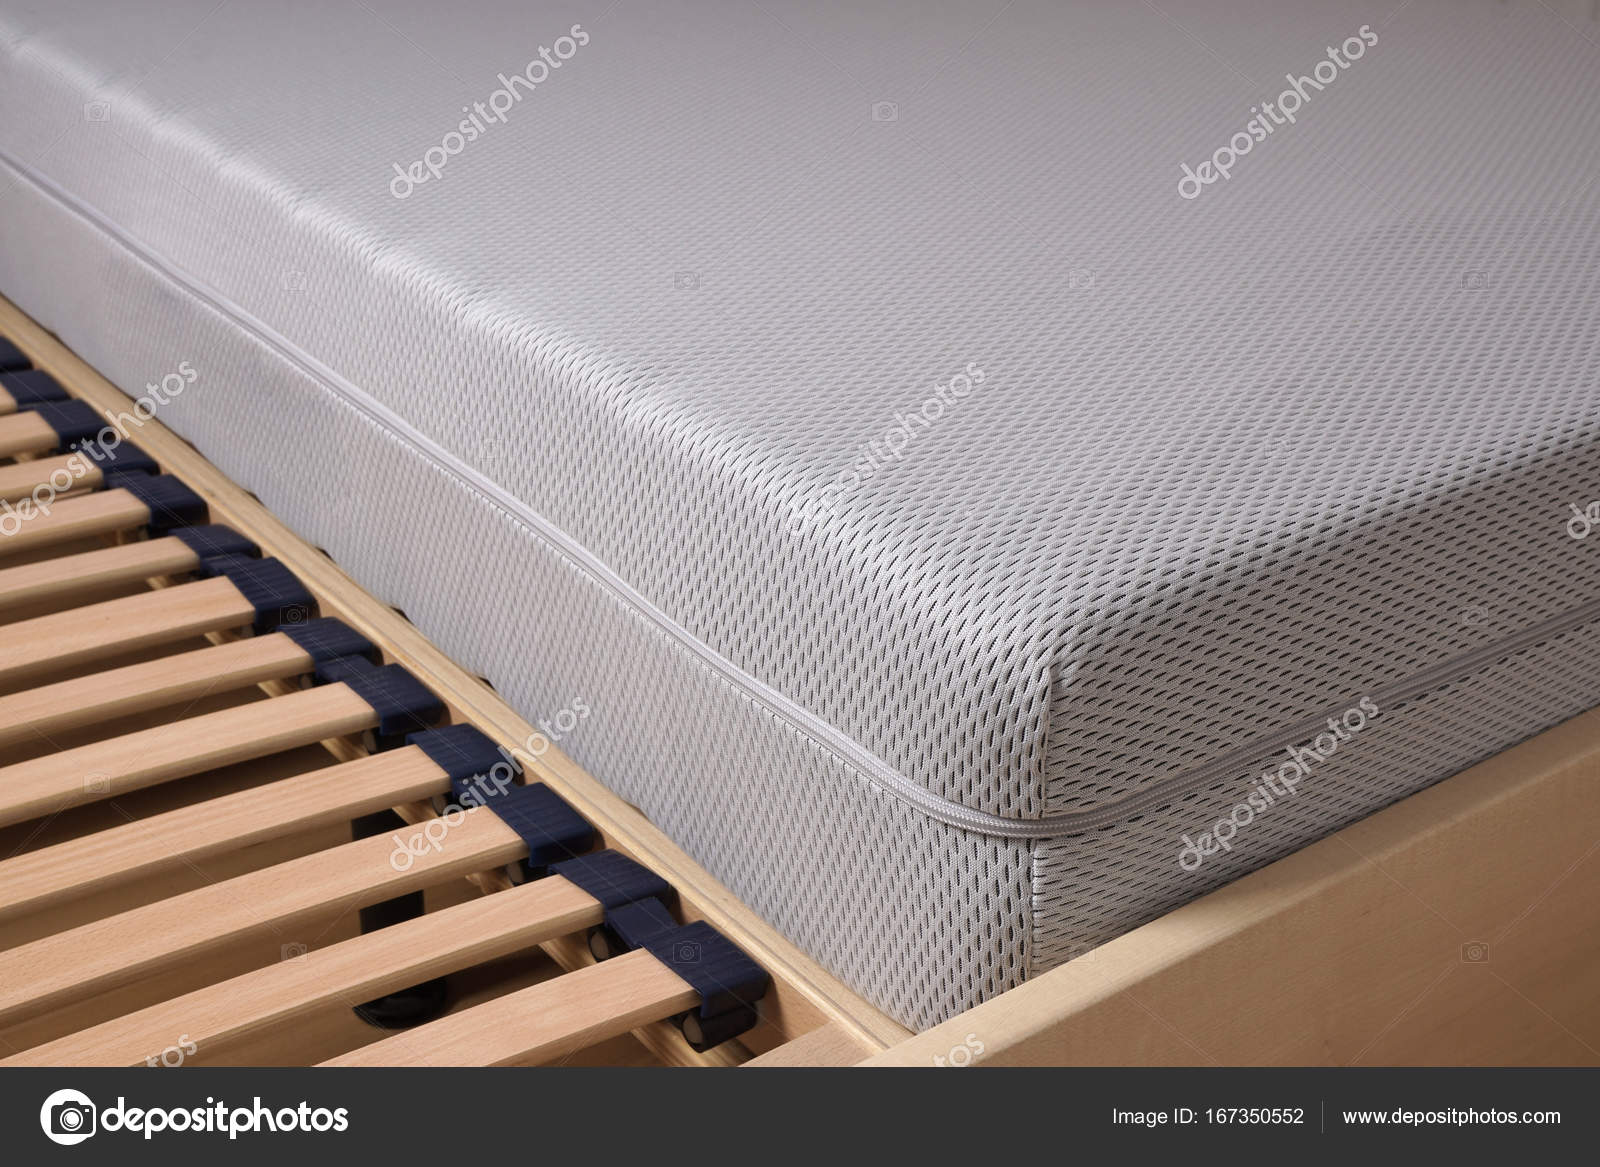 cold foam mattress on slatted frame — Stock Photo © buecax #167350552